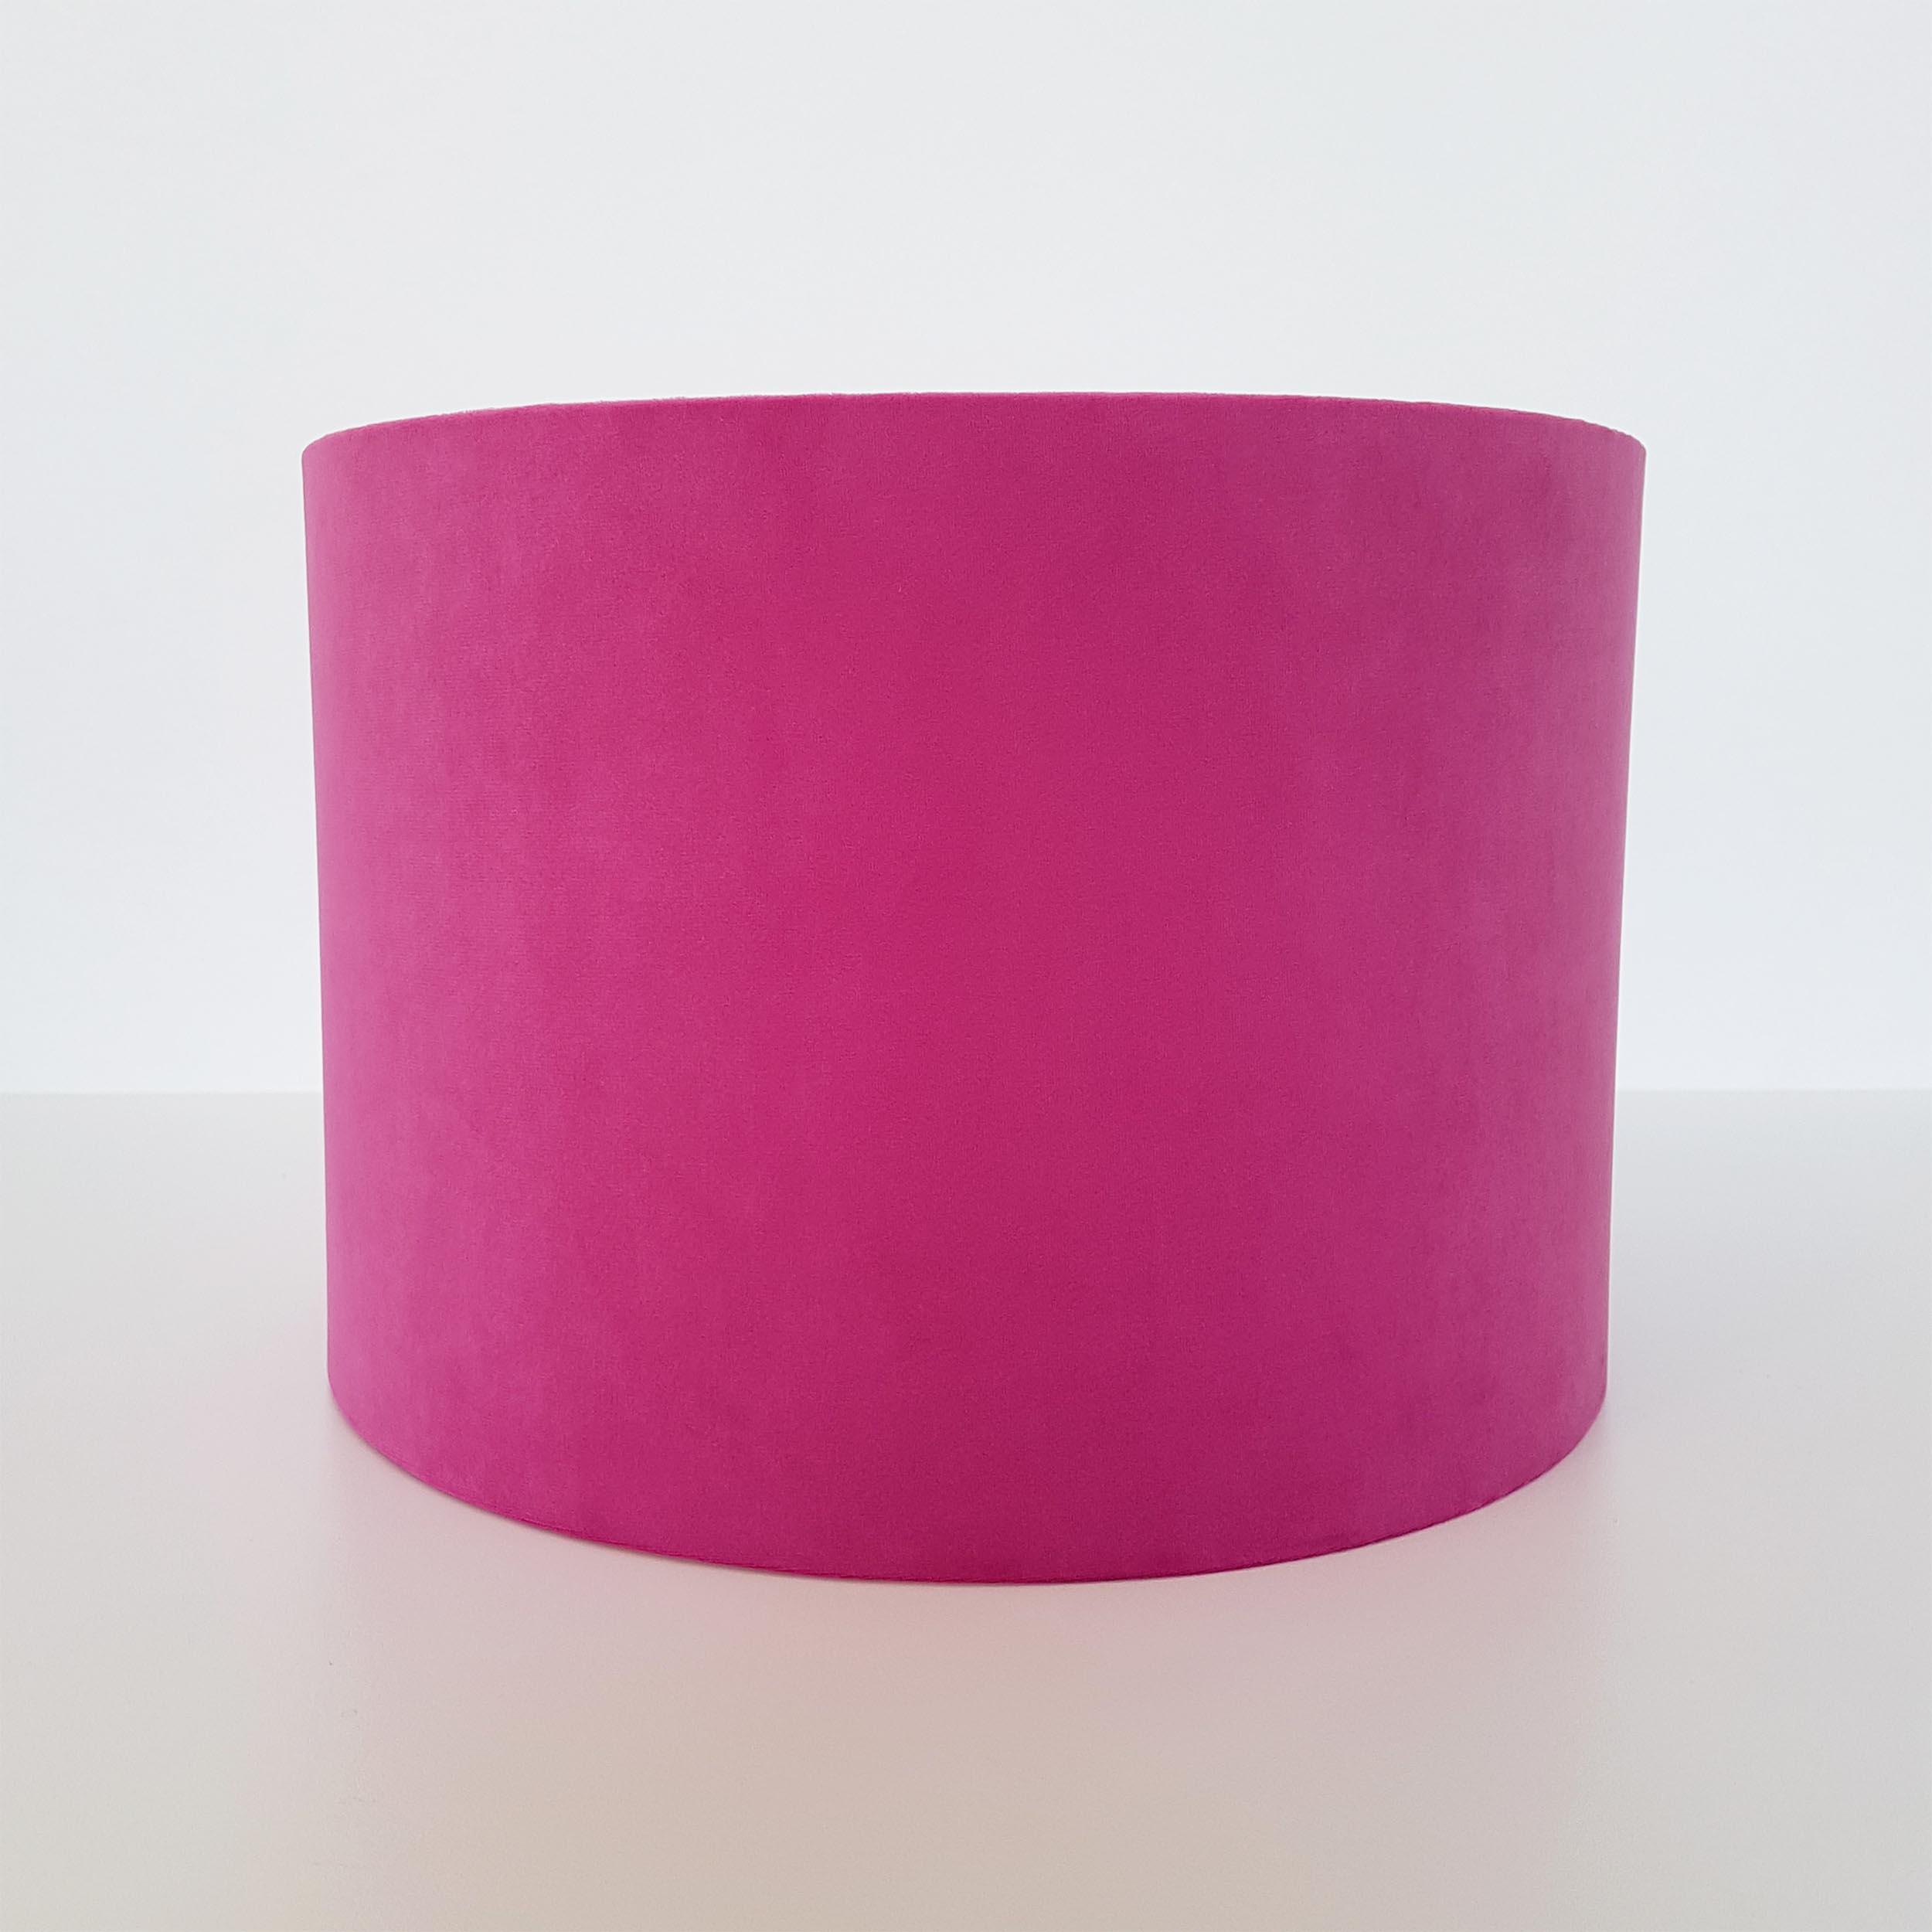 Bright Pink Lampshade in Velvet